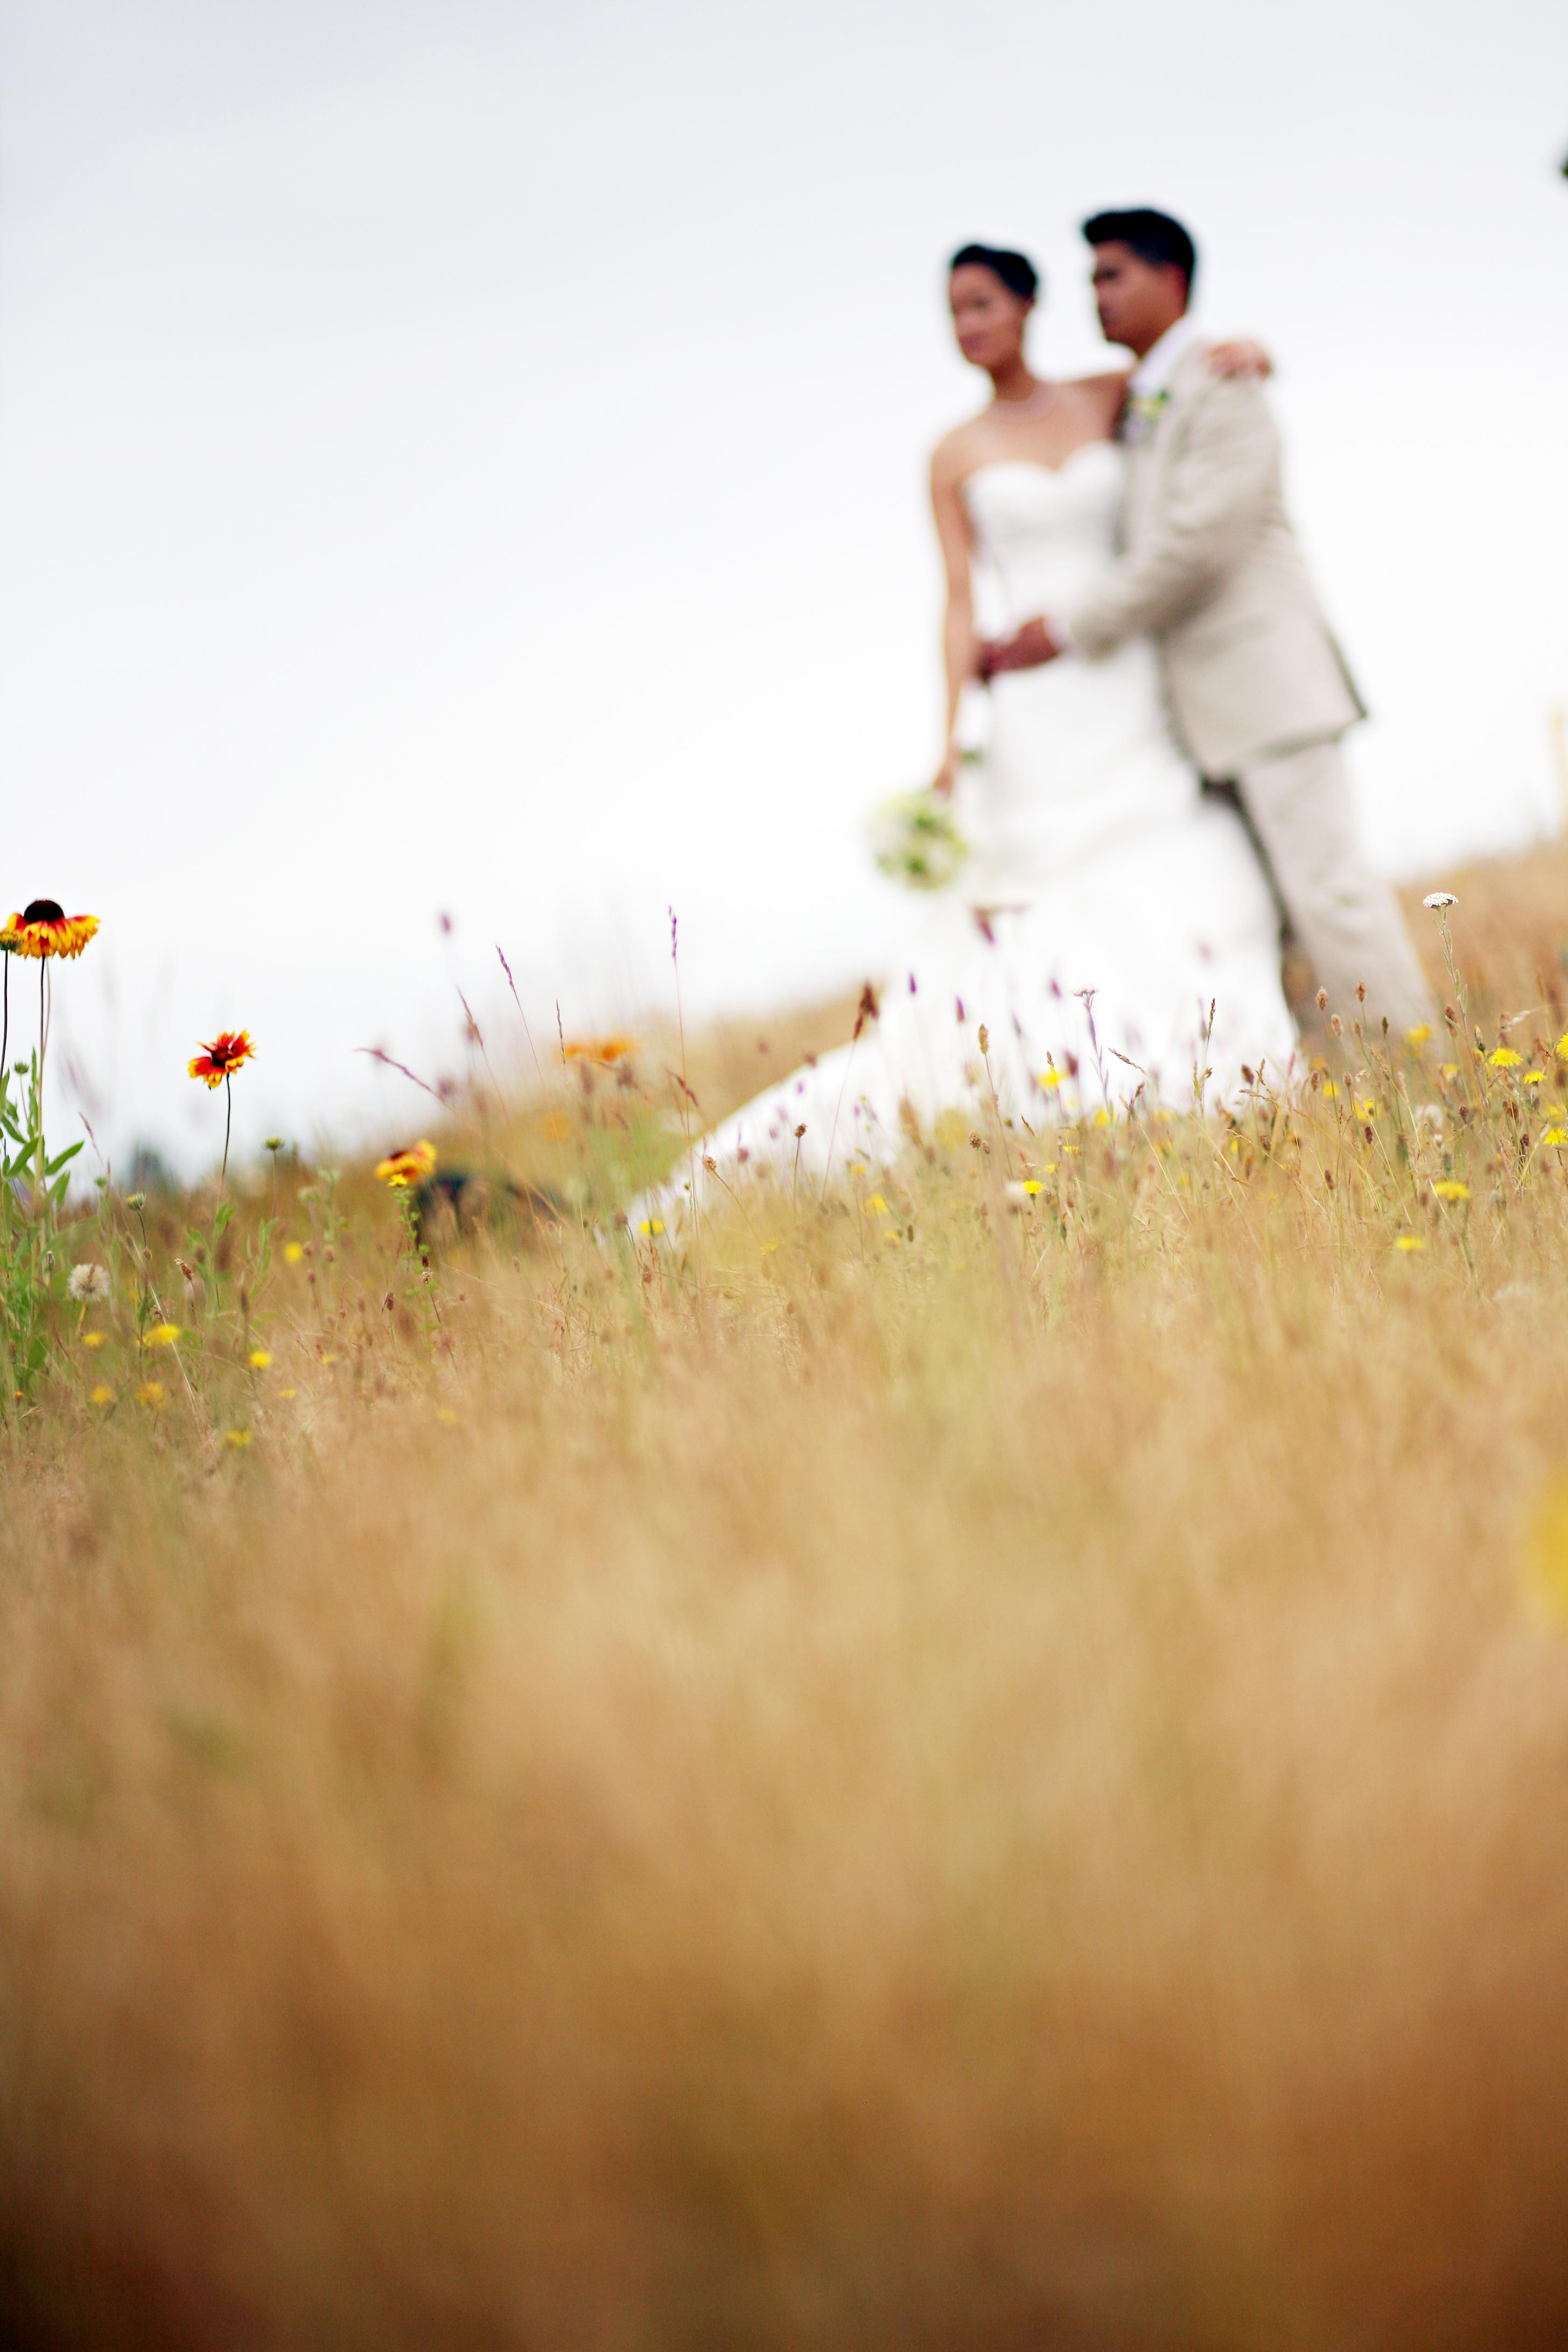 hubbardphotography.com00226